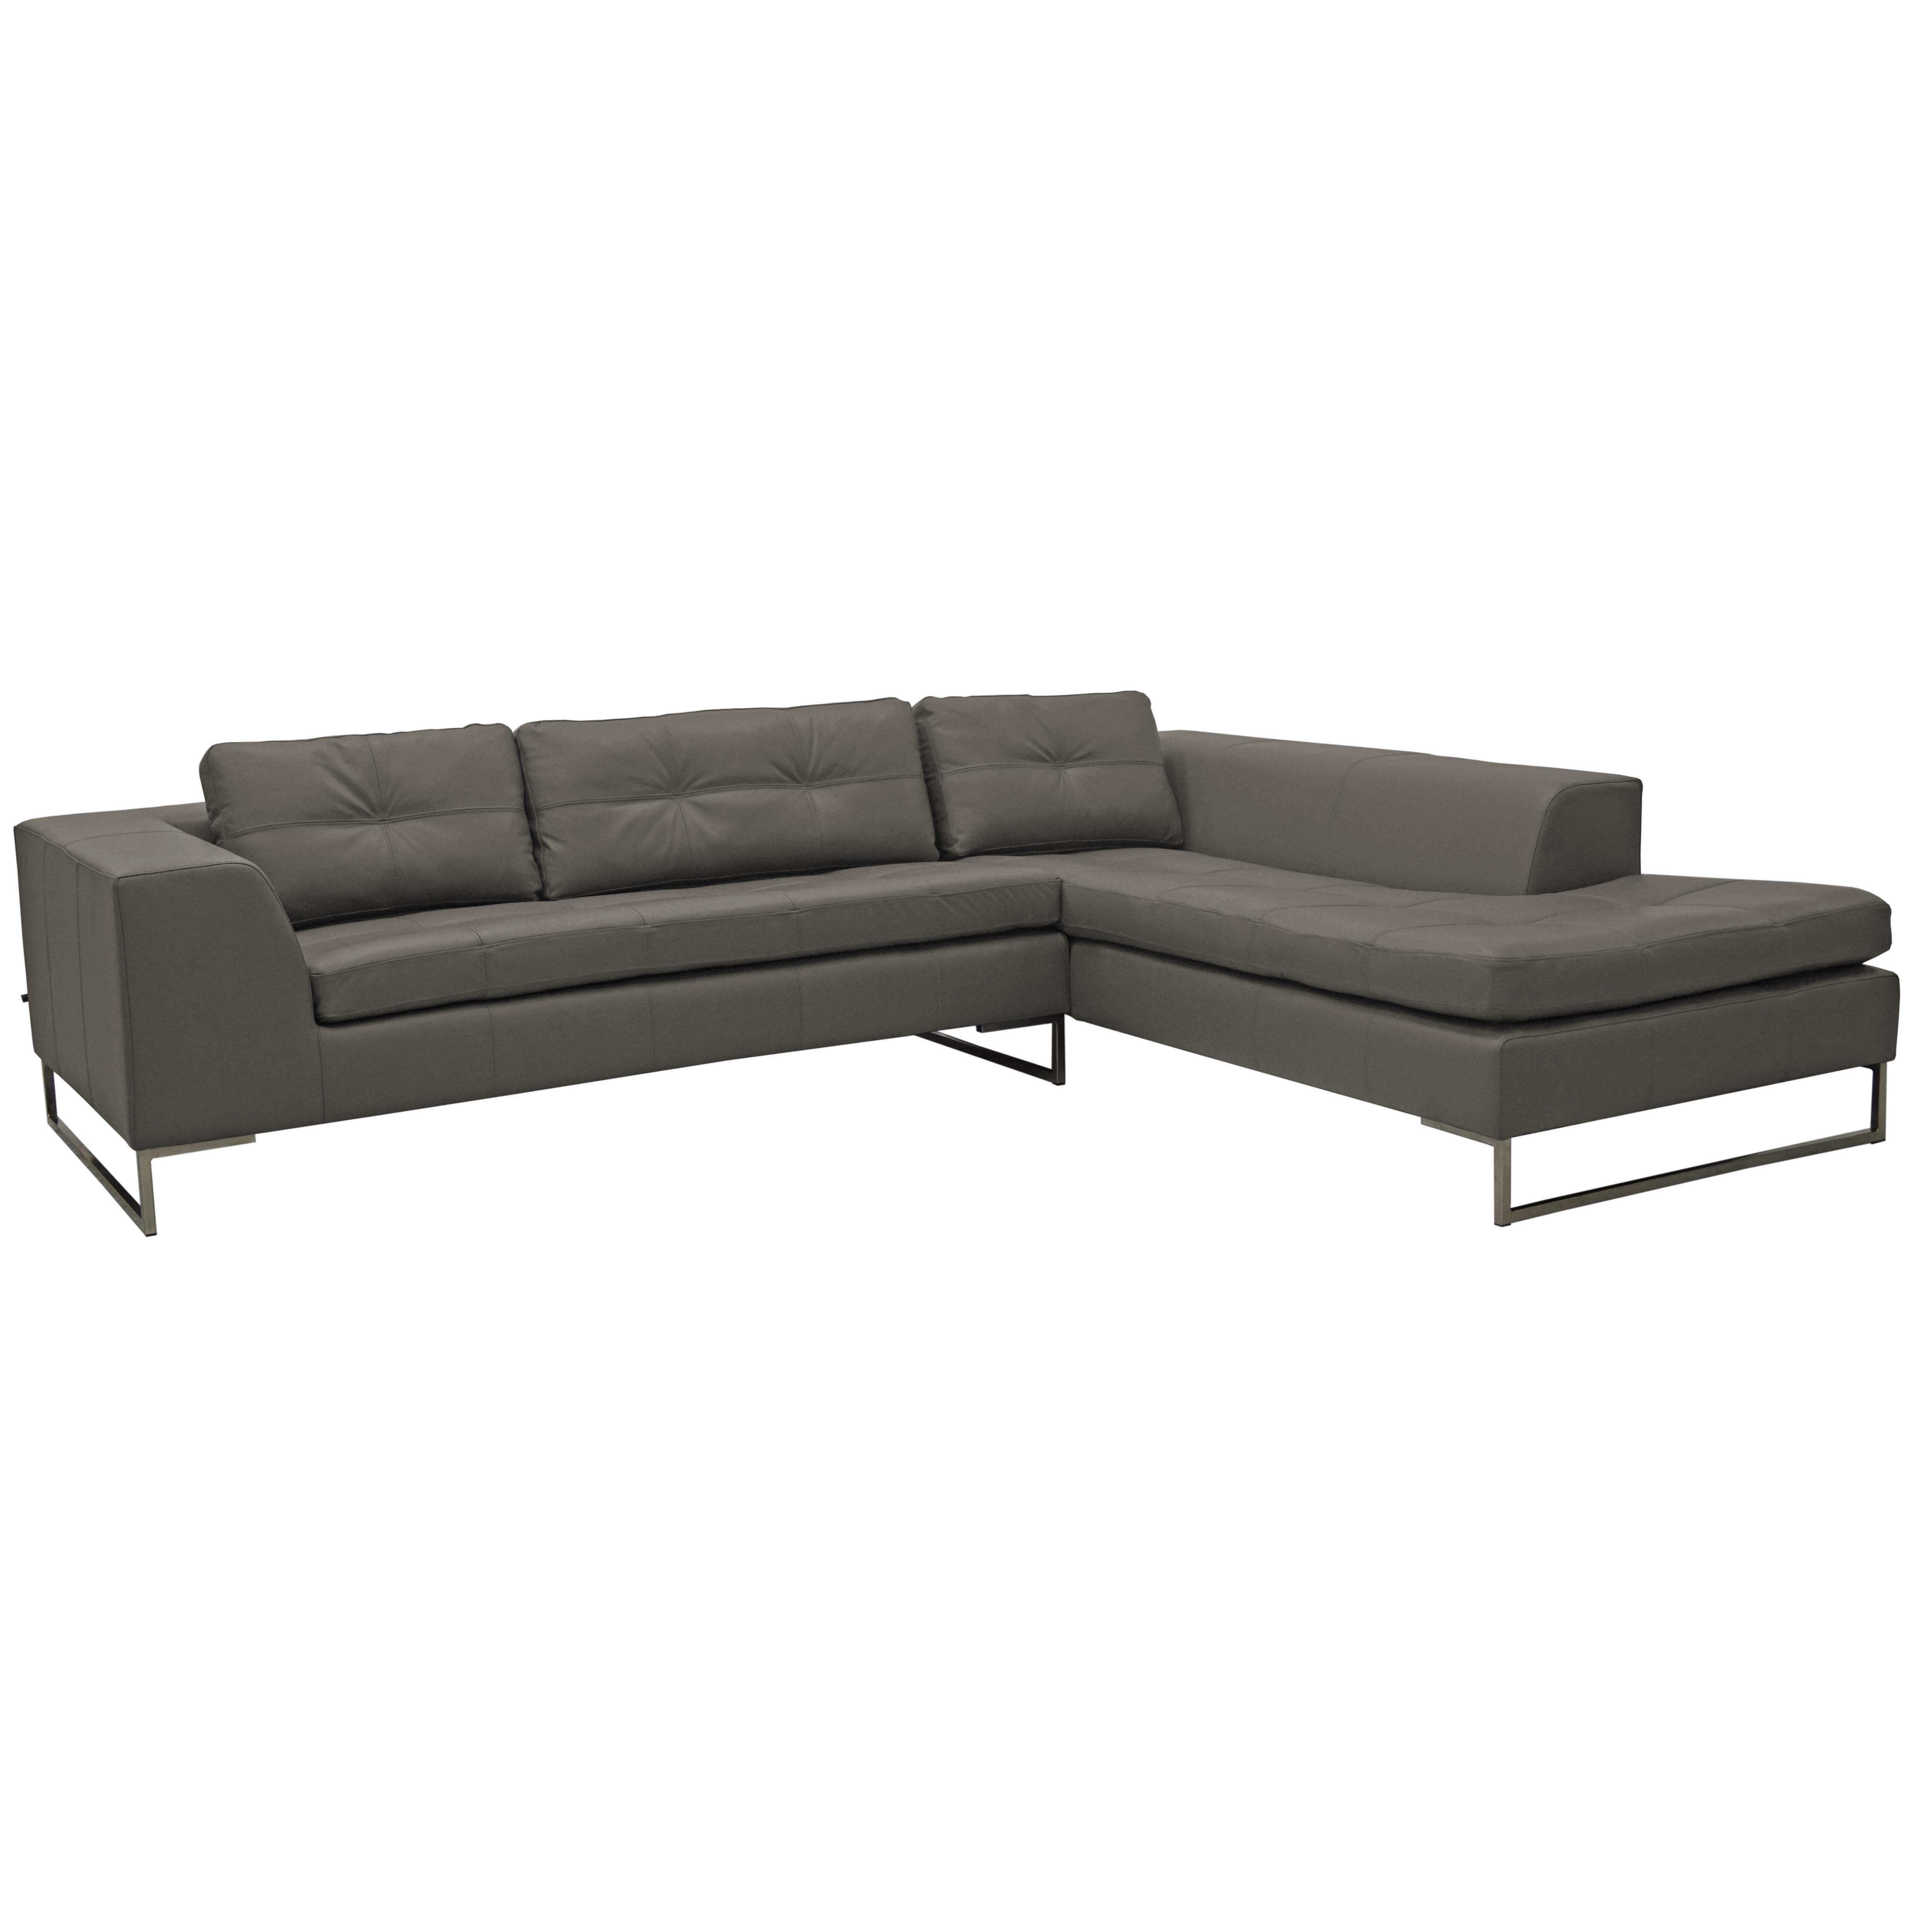 Toleda left hand facing arm corner sofa mollis leather light grey